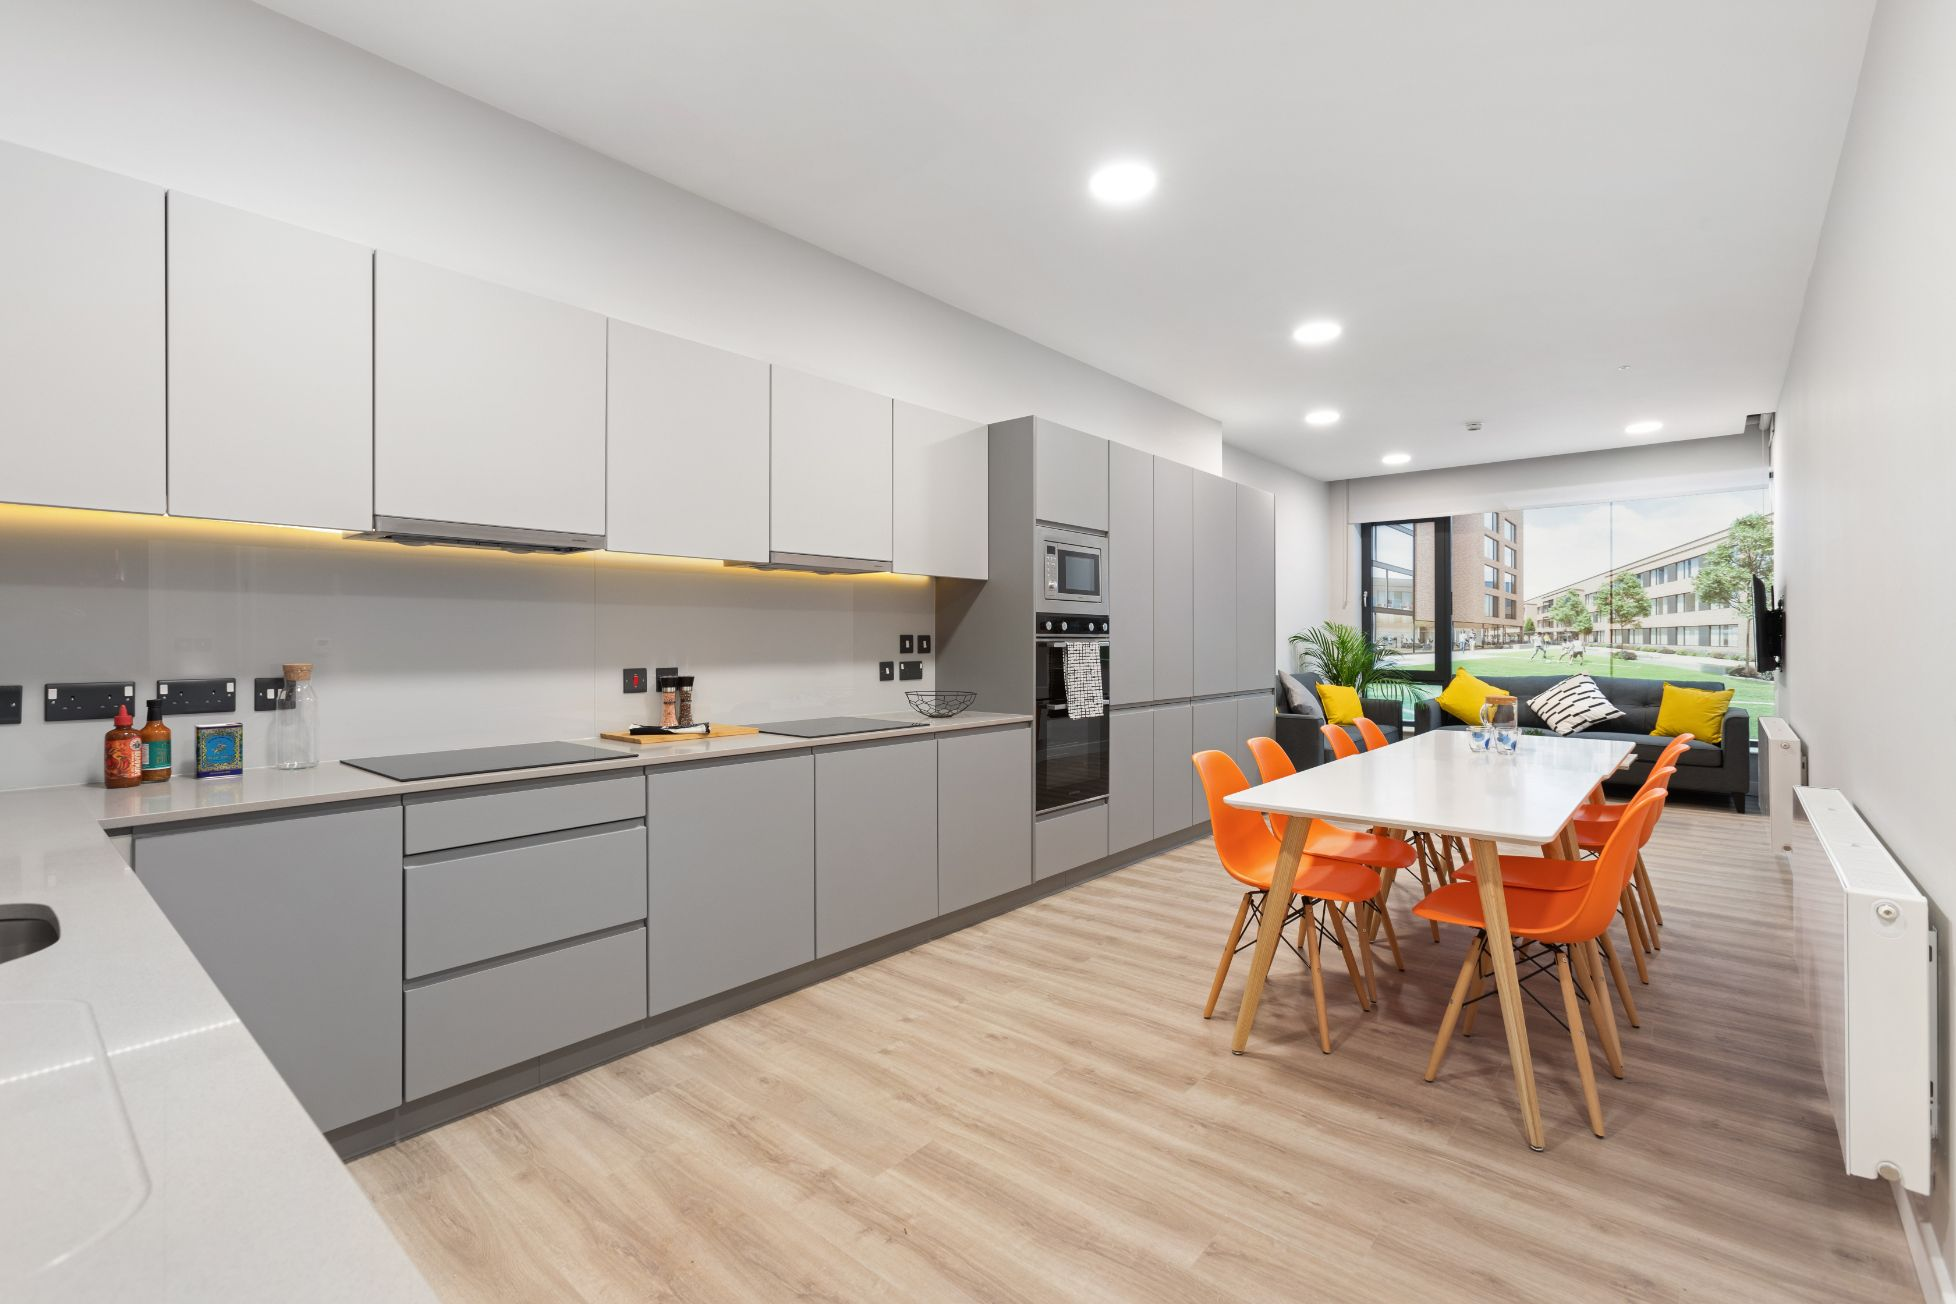 Highfield-House-Dublin-Kitchen-Area2-Unilodgers